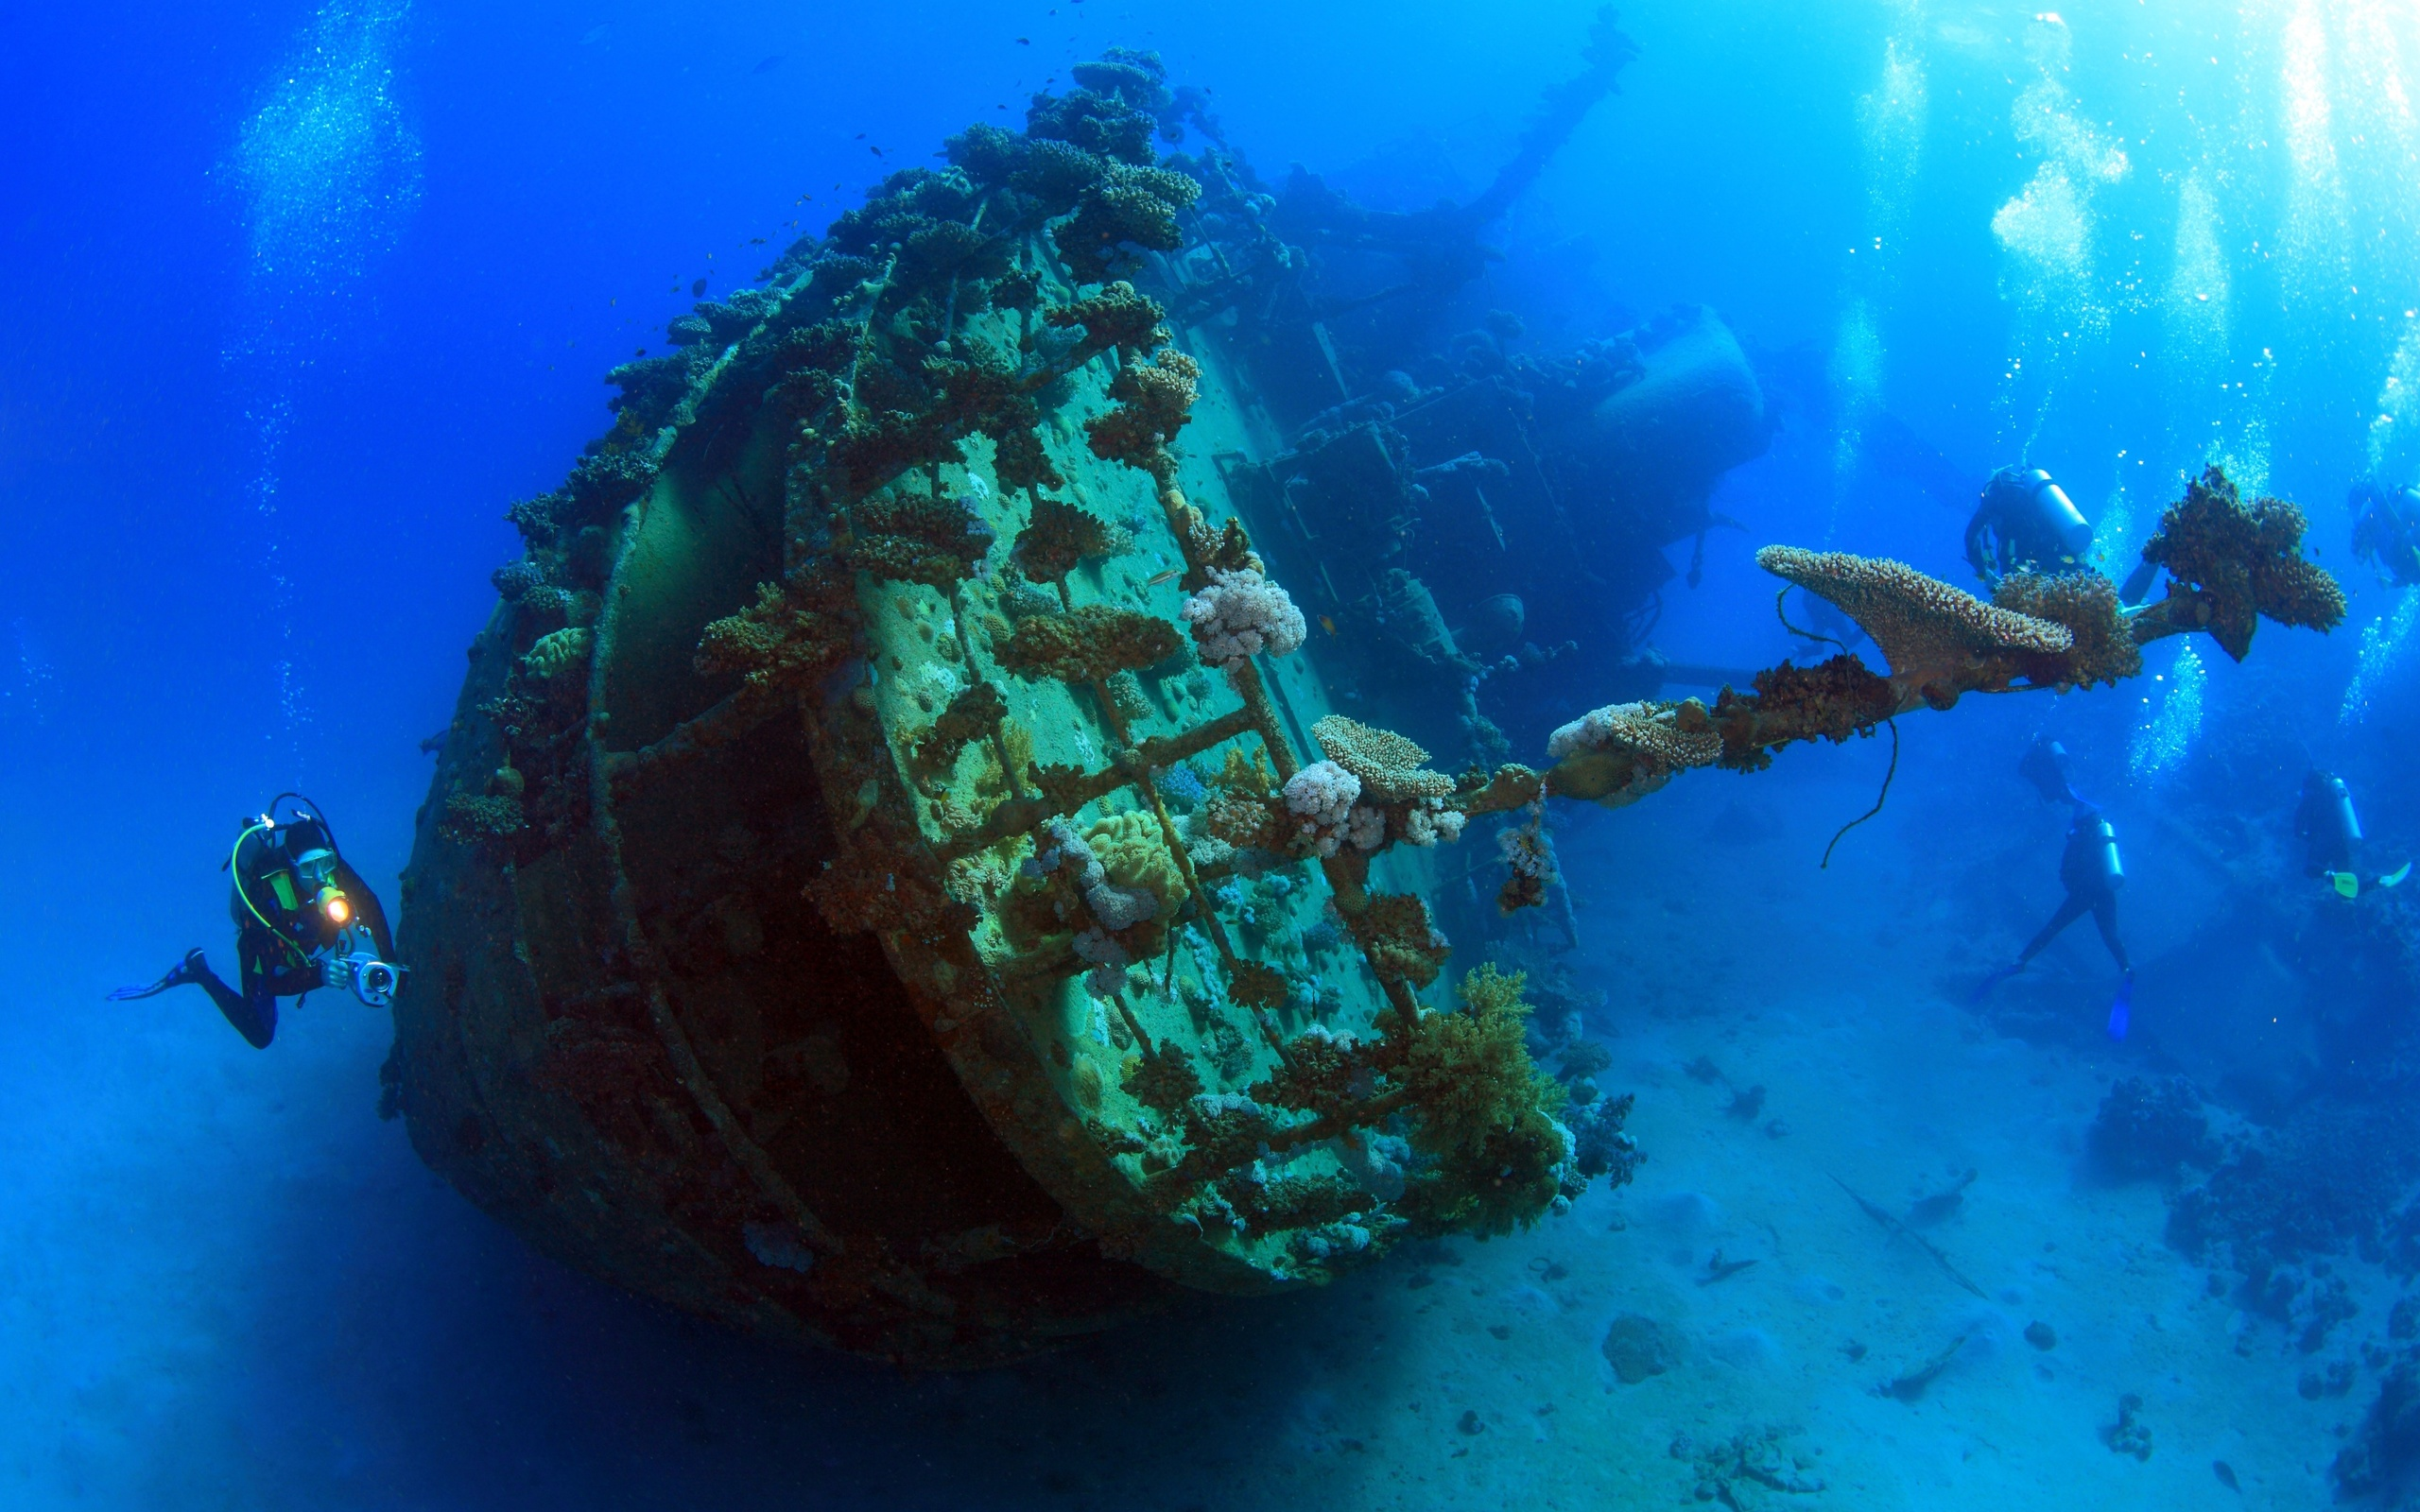 всех сотрясений картинки затонувшего корабля один дней пара